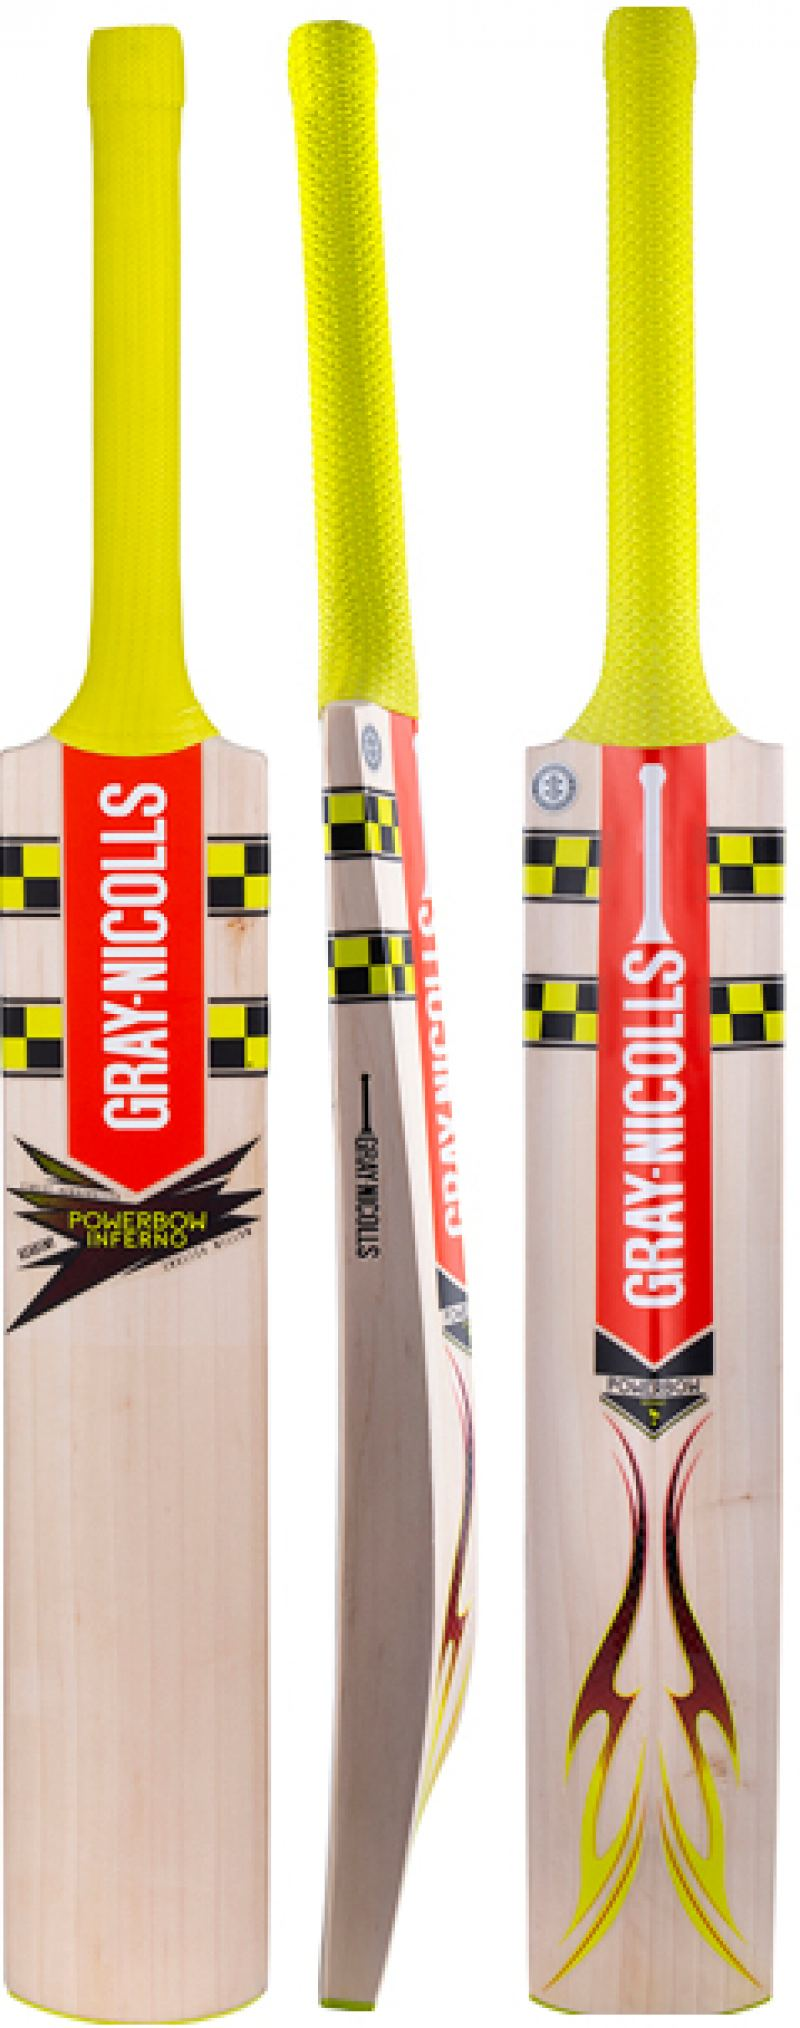 Gray Nicolls Powerbow Inferno Academy Junior Cricket Bat